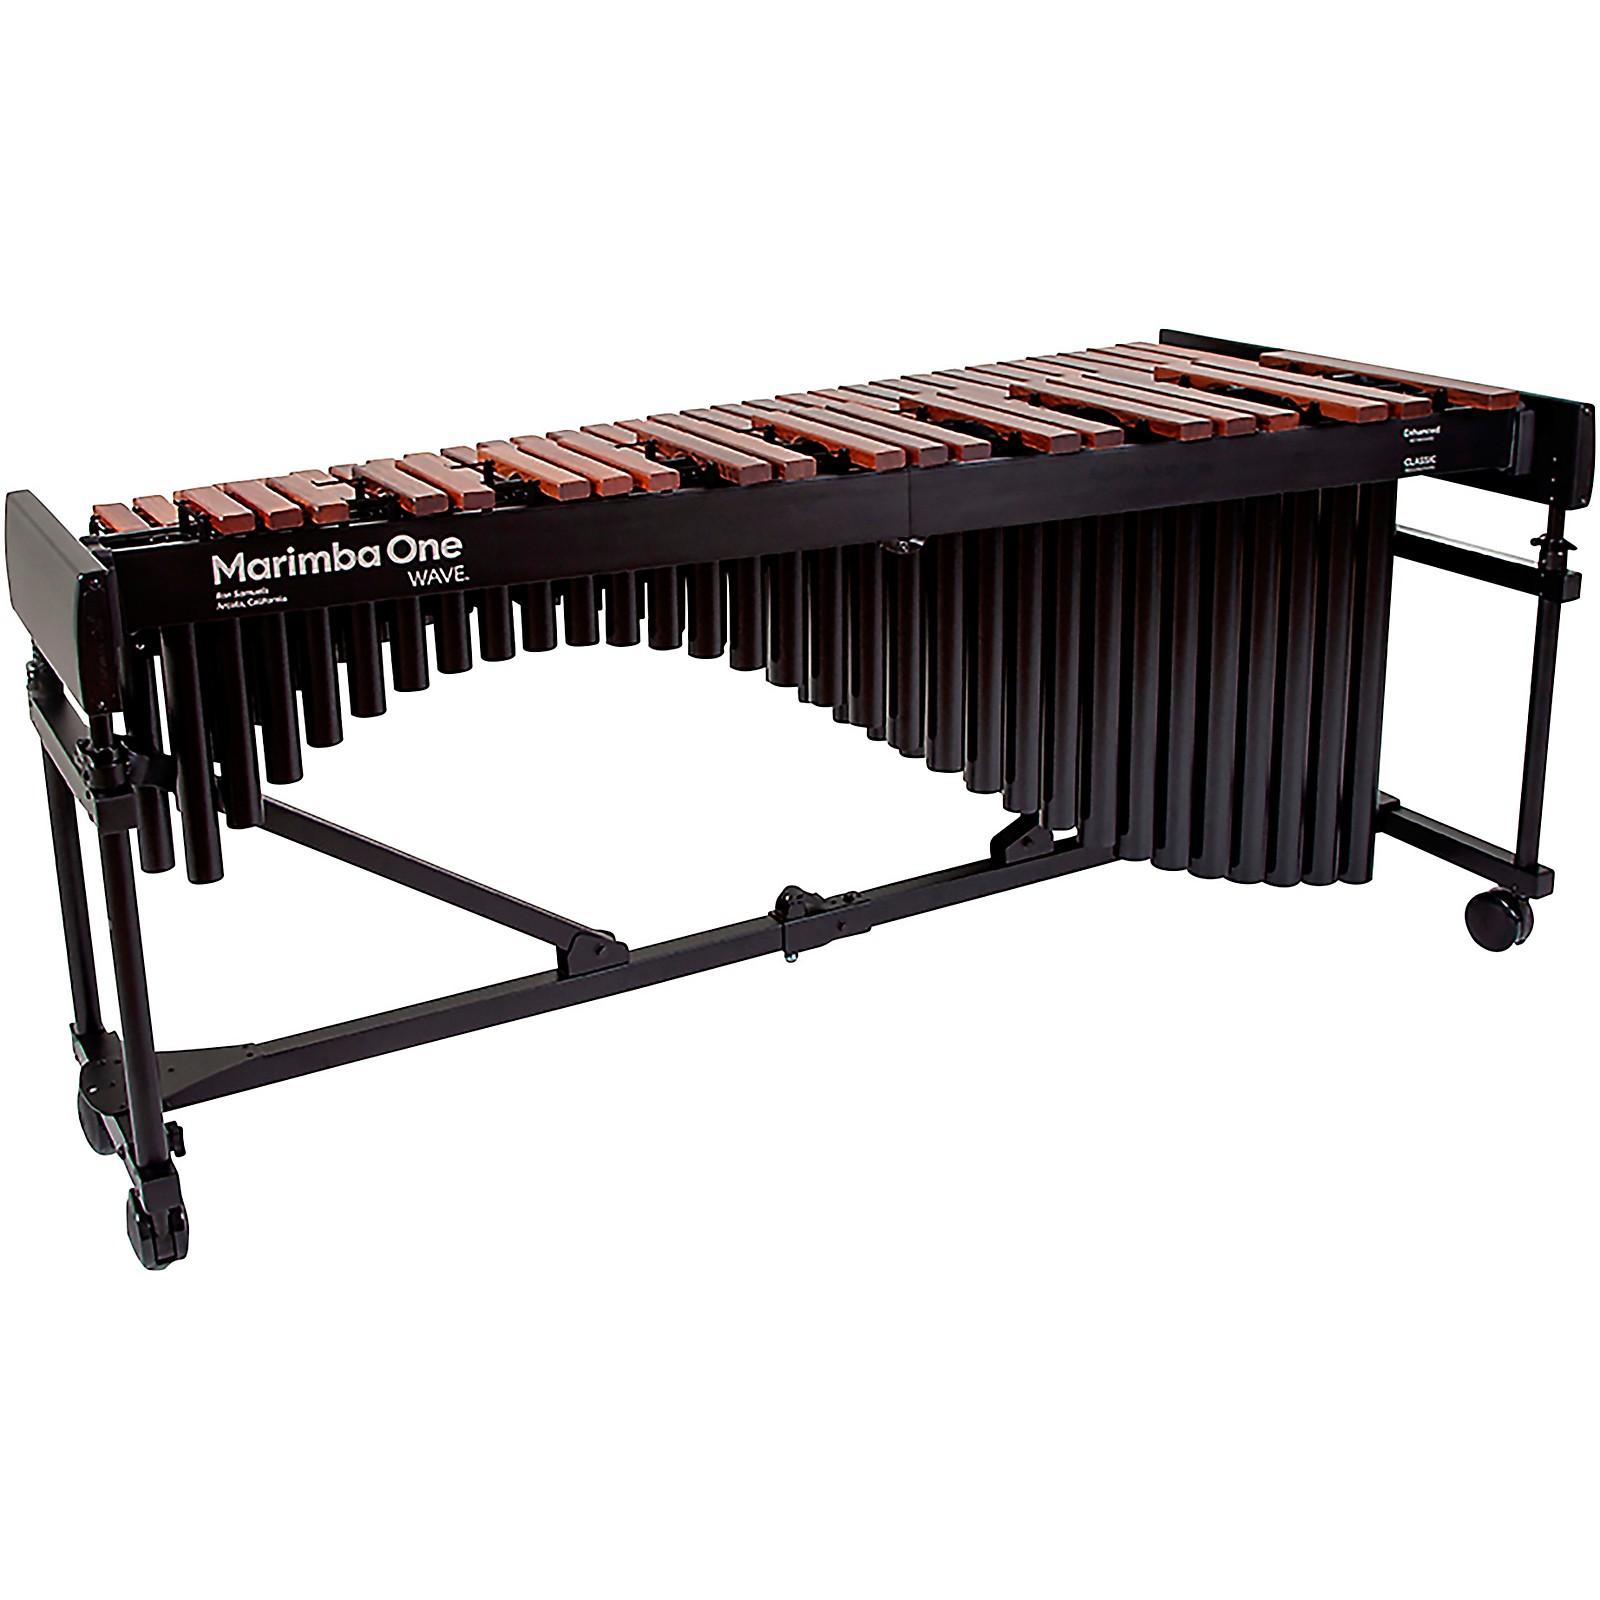 Marimba One Wave #9621 A442 4.3 Octave Marimba with Traditional Keyboard and Classic Resonators 4